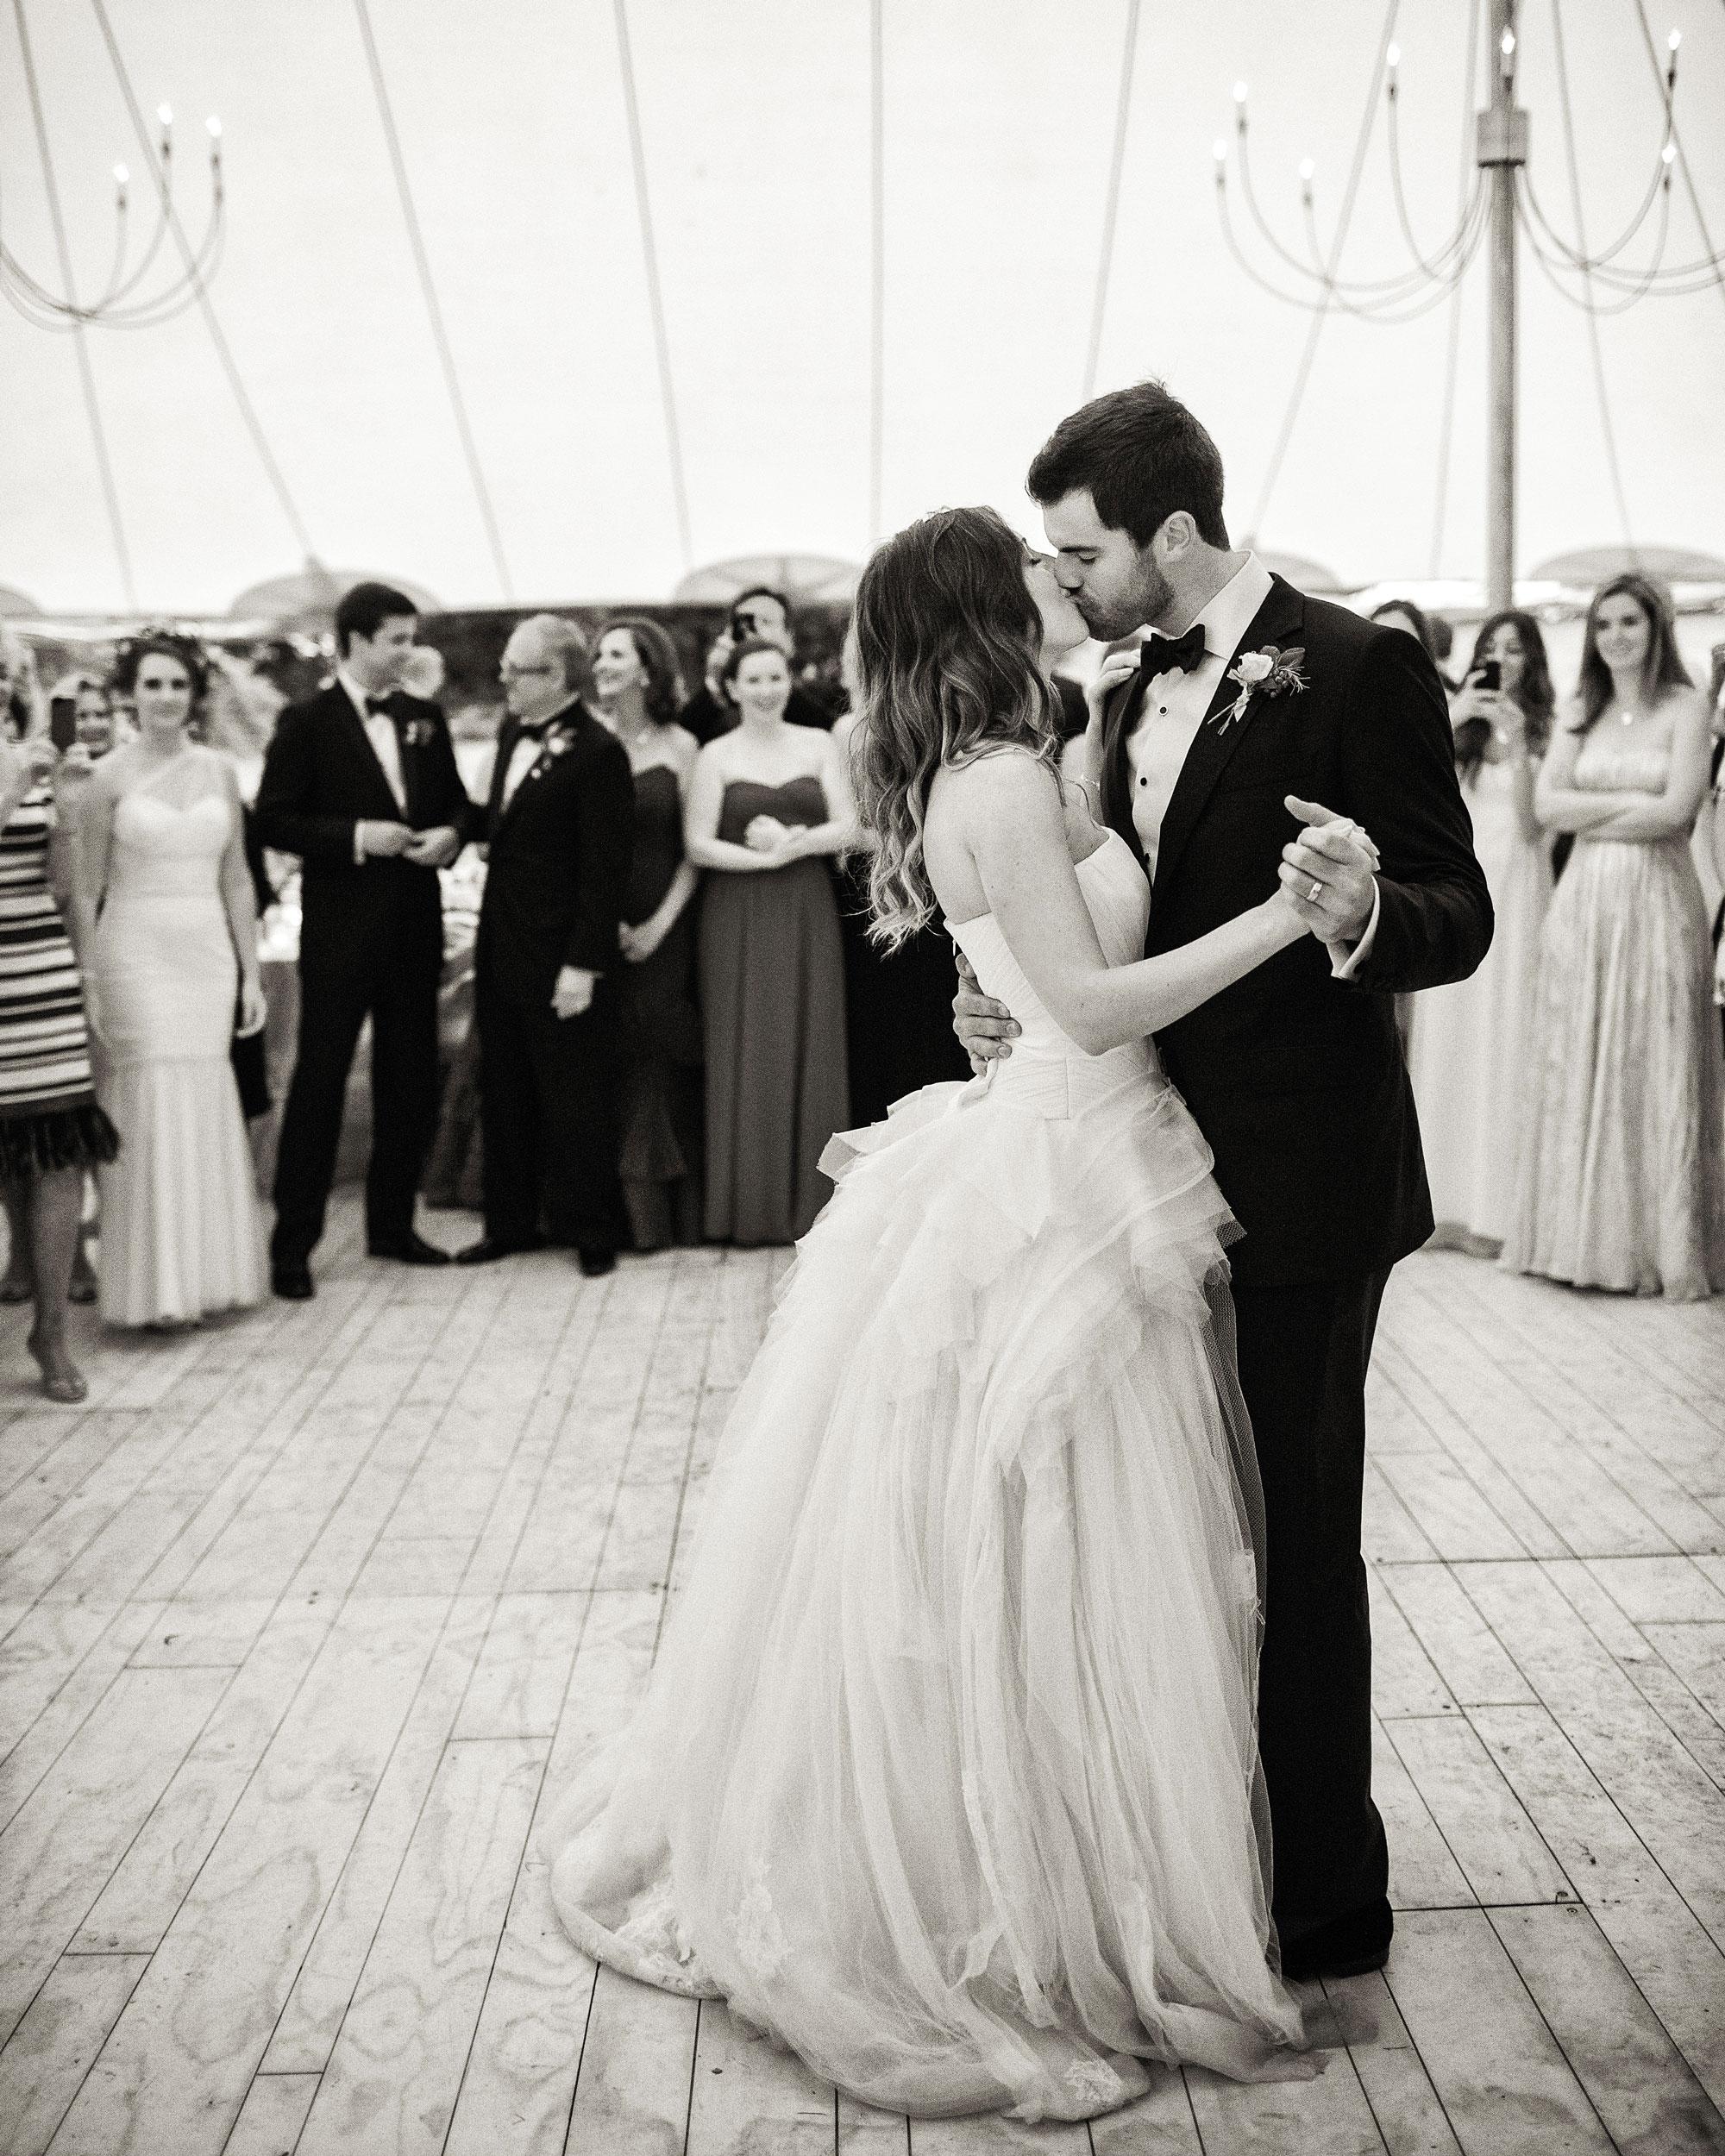 kaitlyn-robert-wedding-firstdance-0149-s112718-0316.jpg